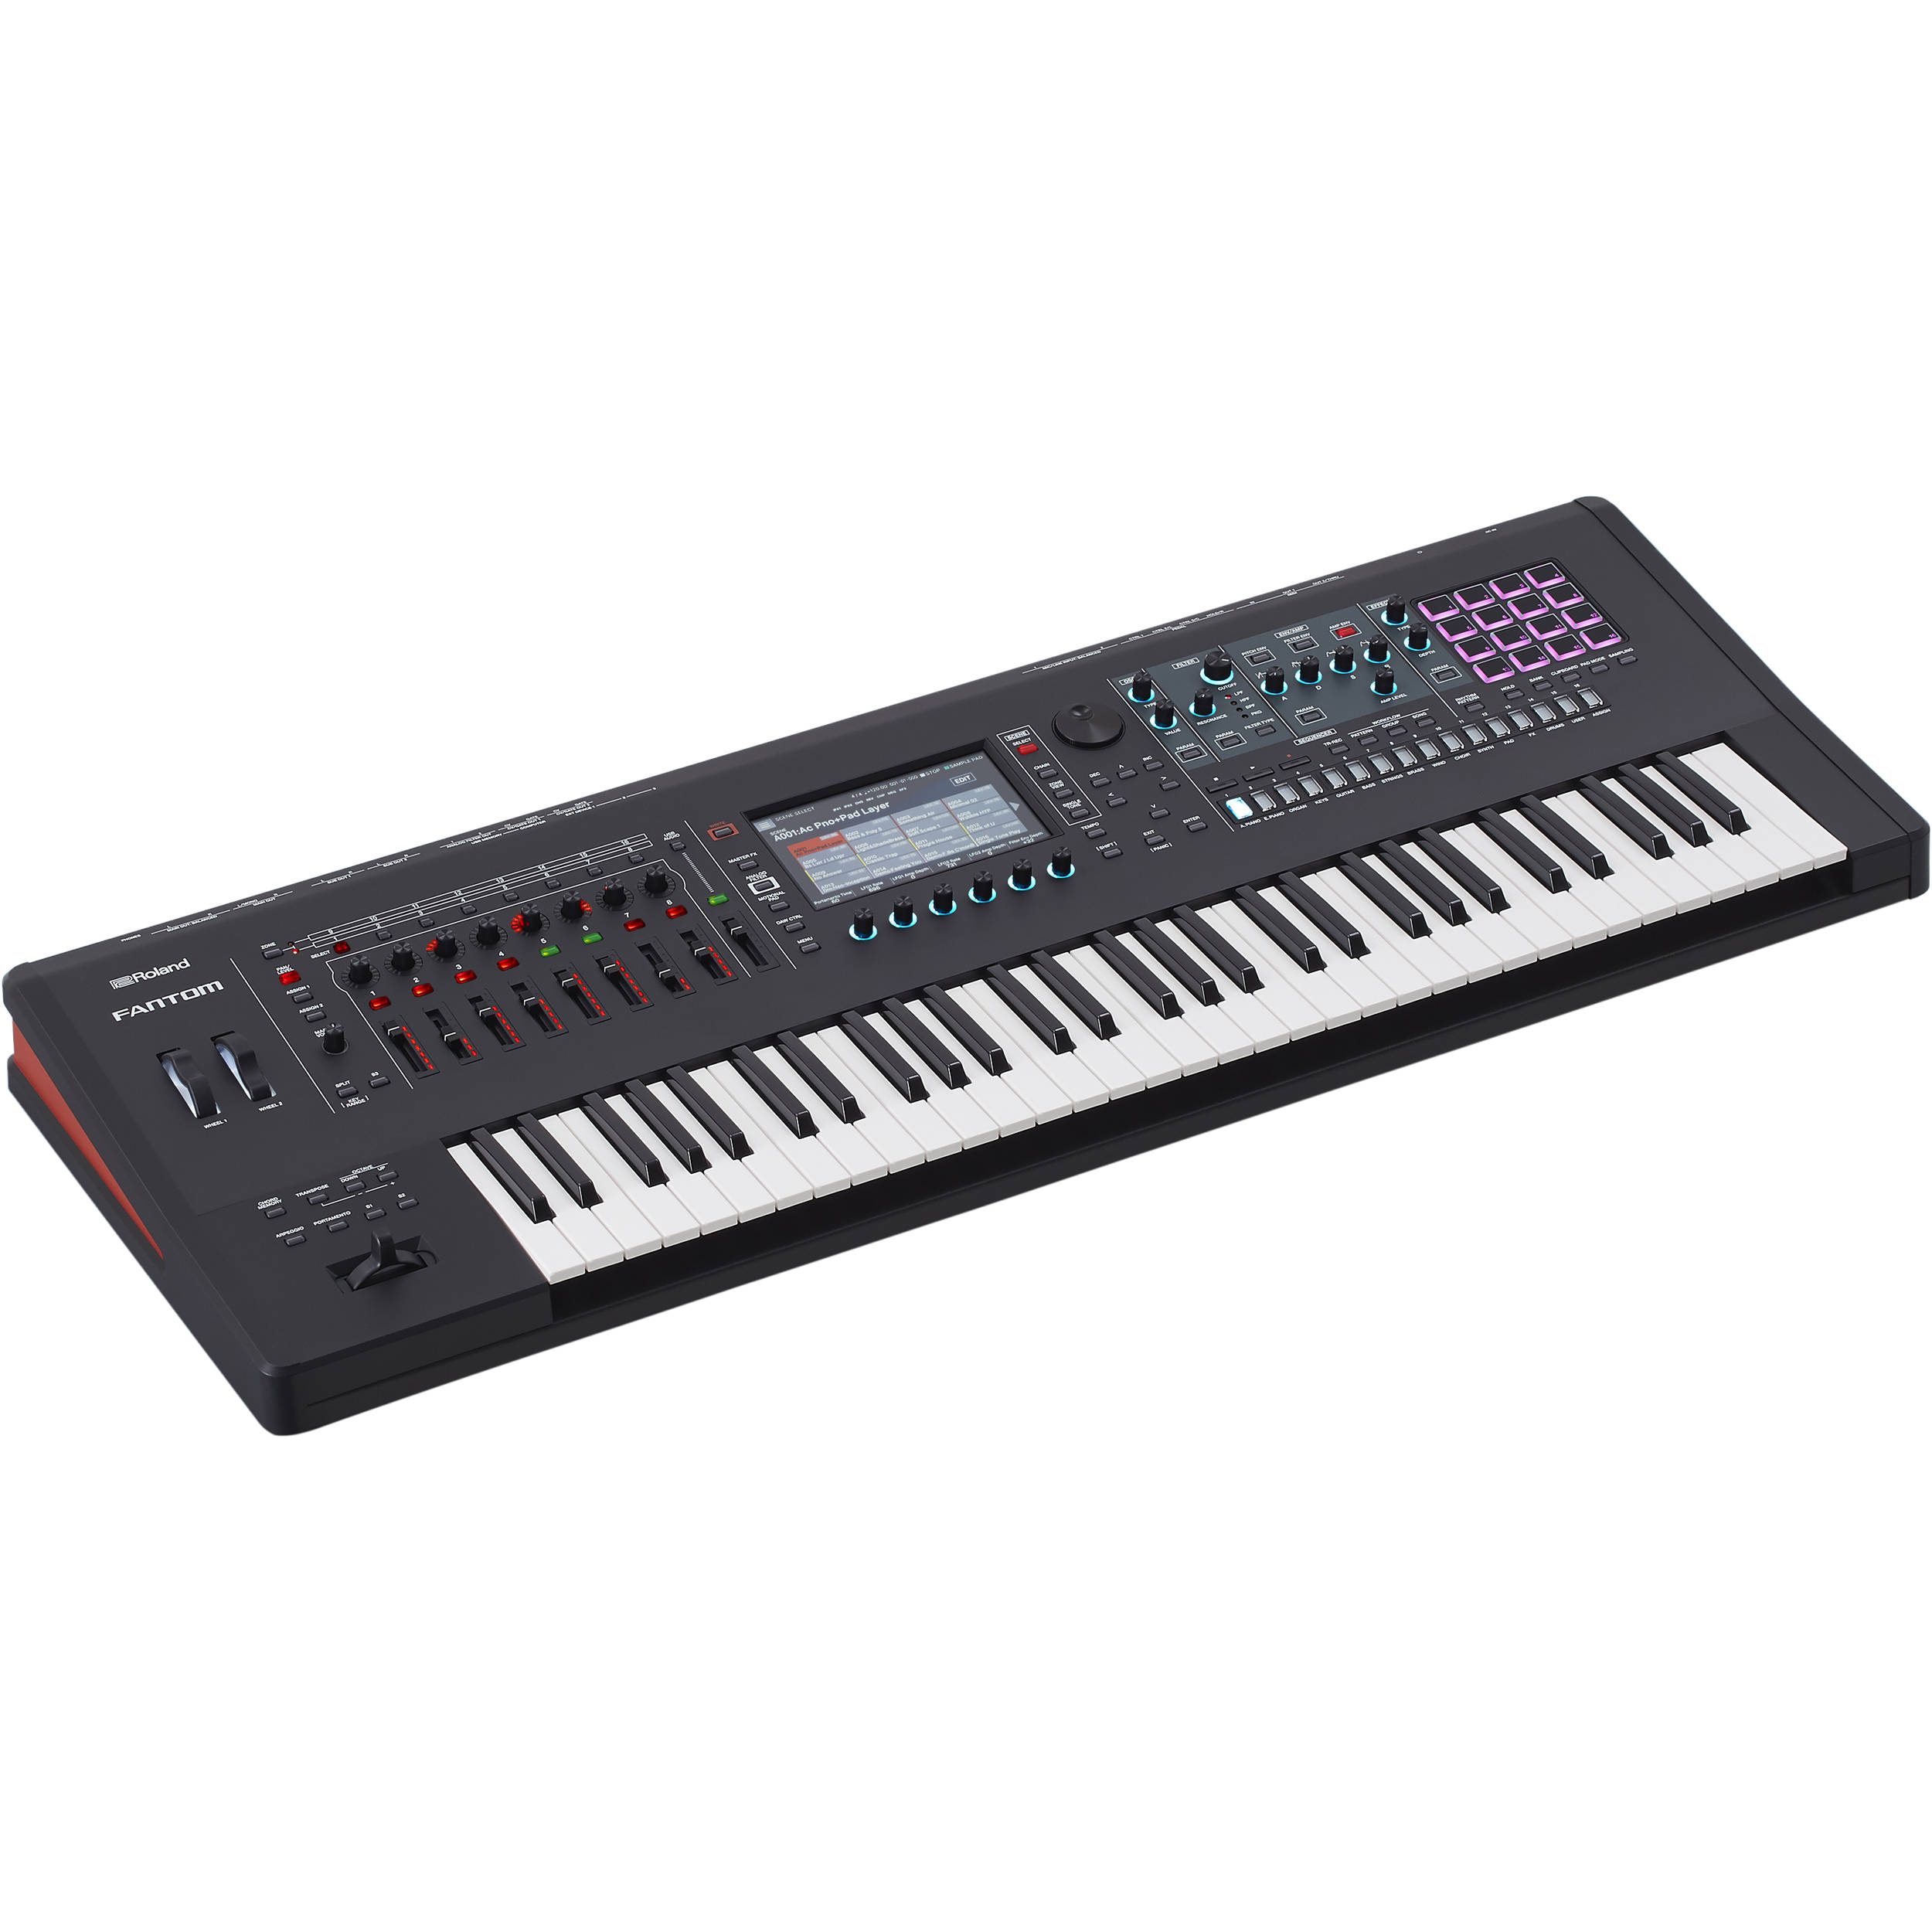 88-Tasten Digital Piano Stage Set Keyboard USB MIDI Effekte Ständer Kopfhörer